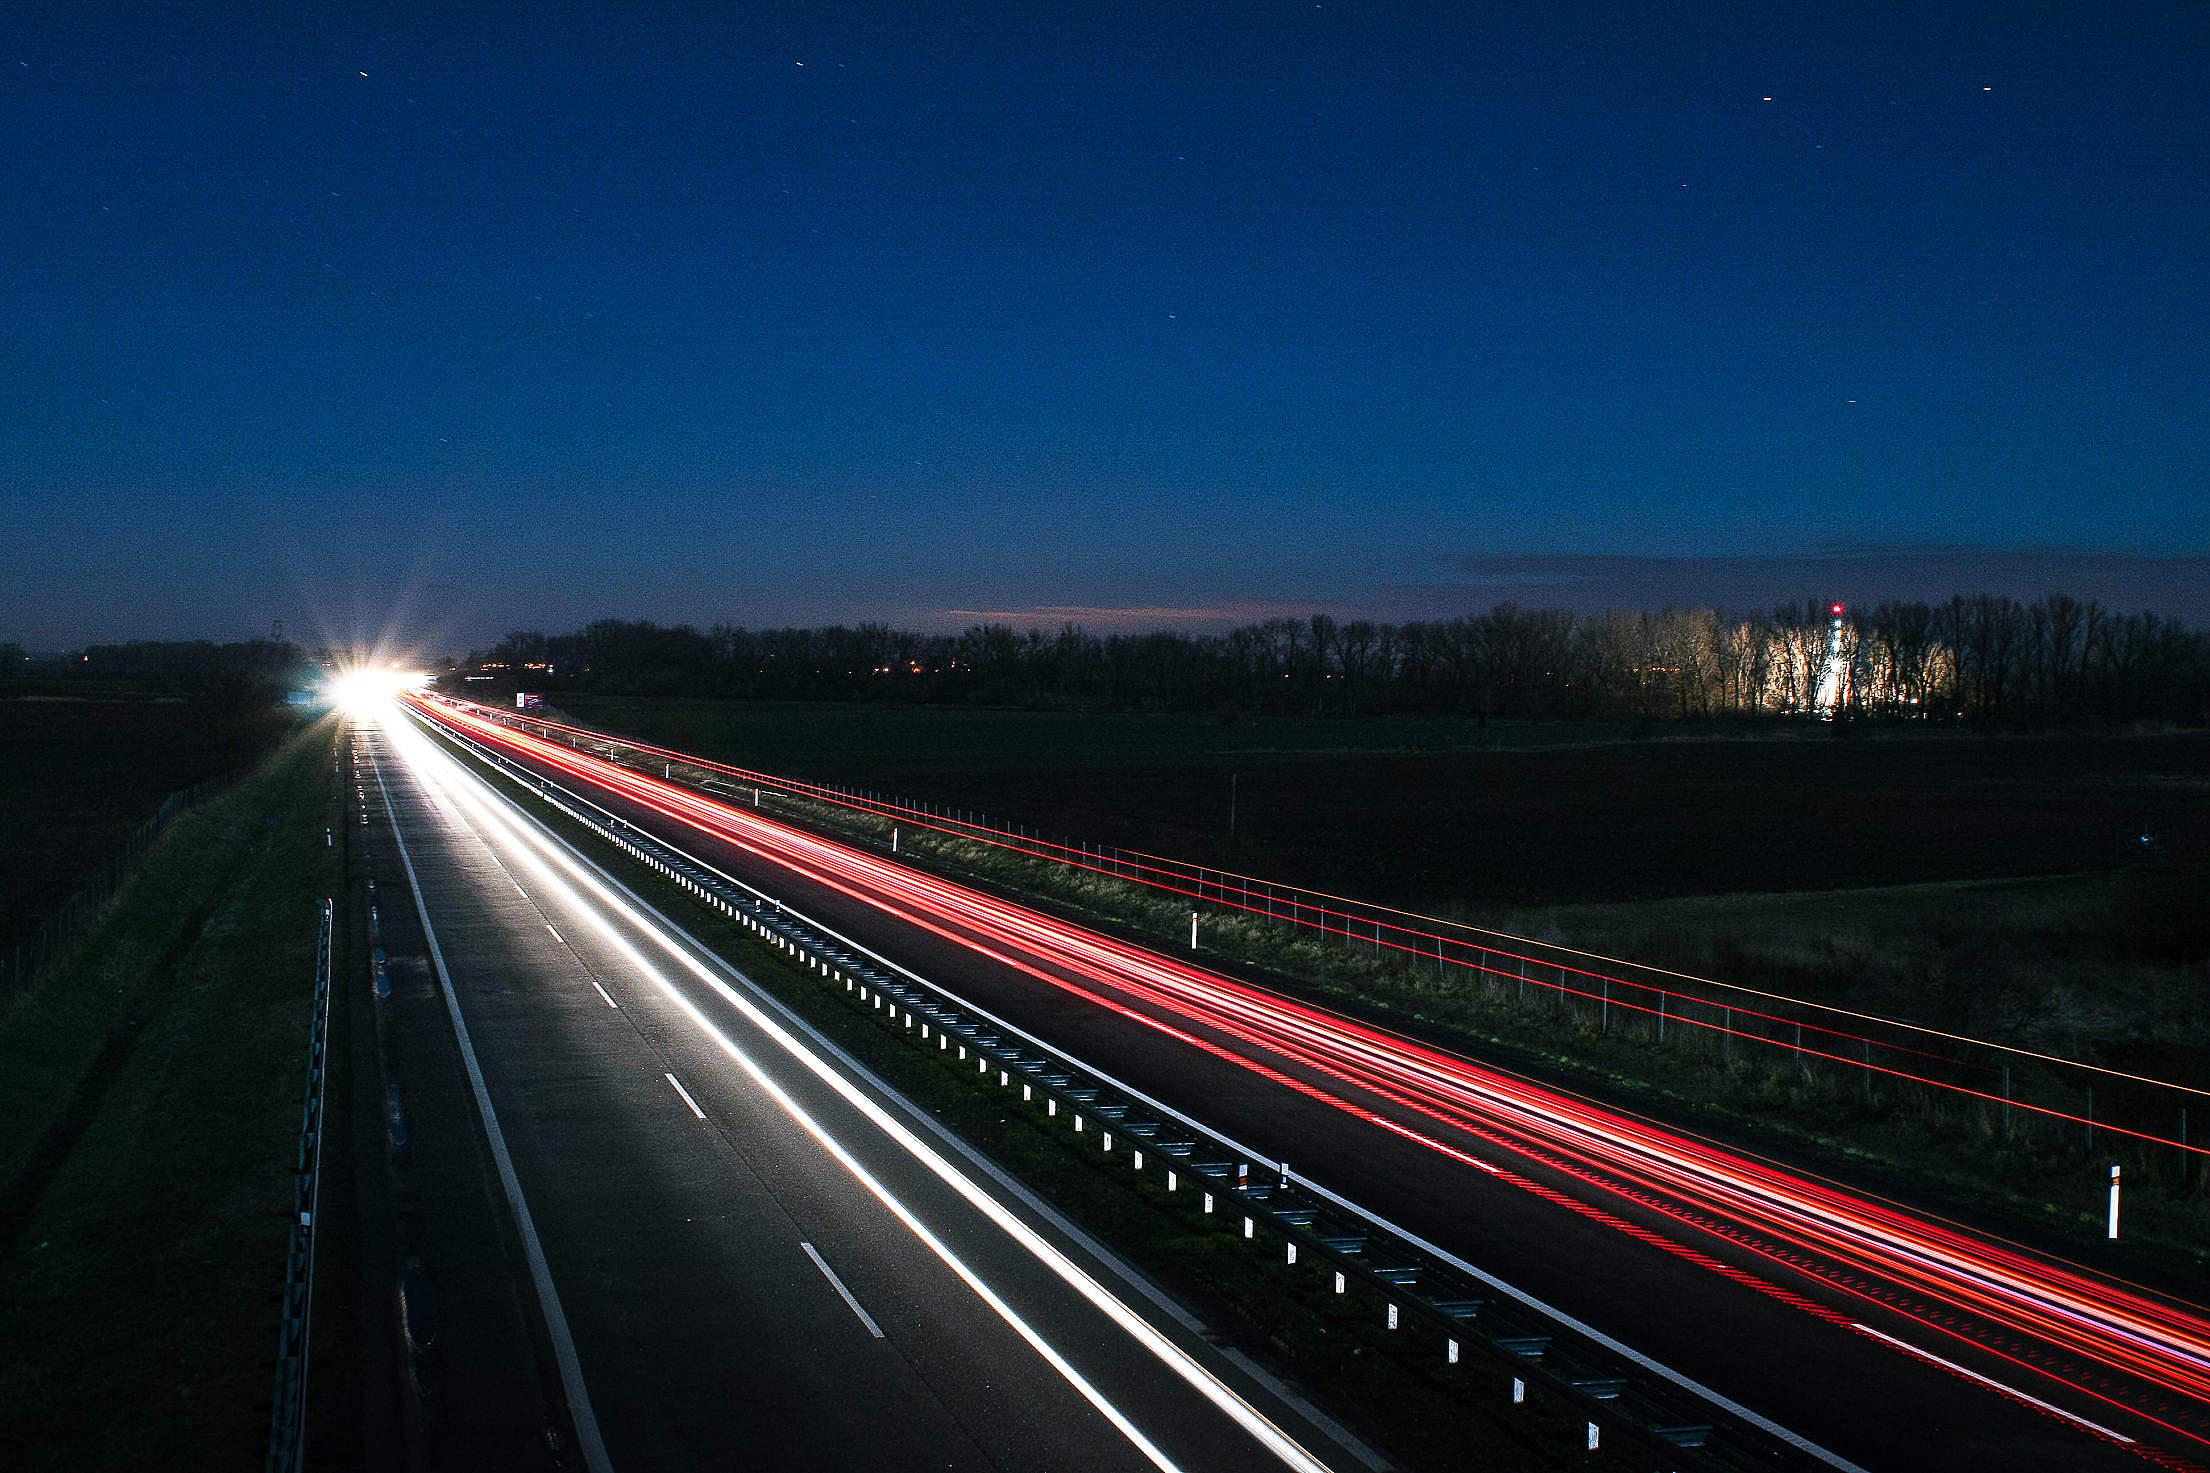 Highway at Night Free Stock Photo